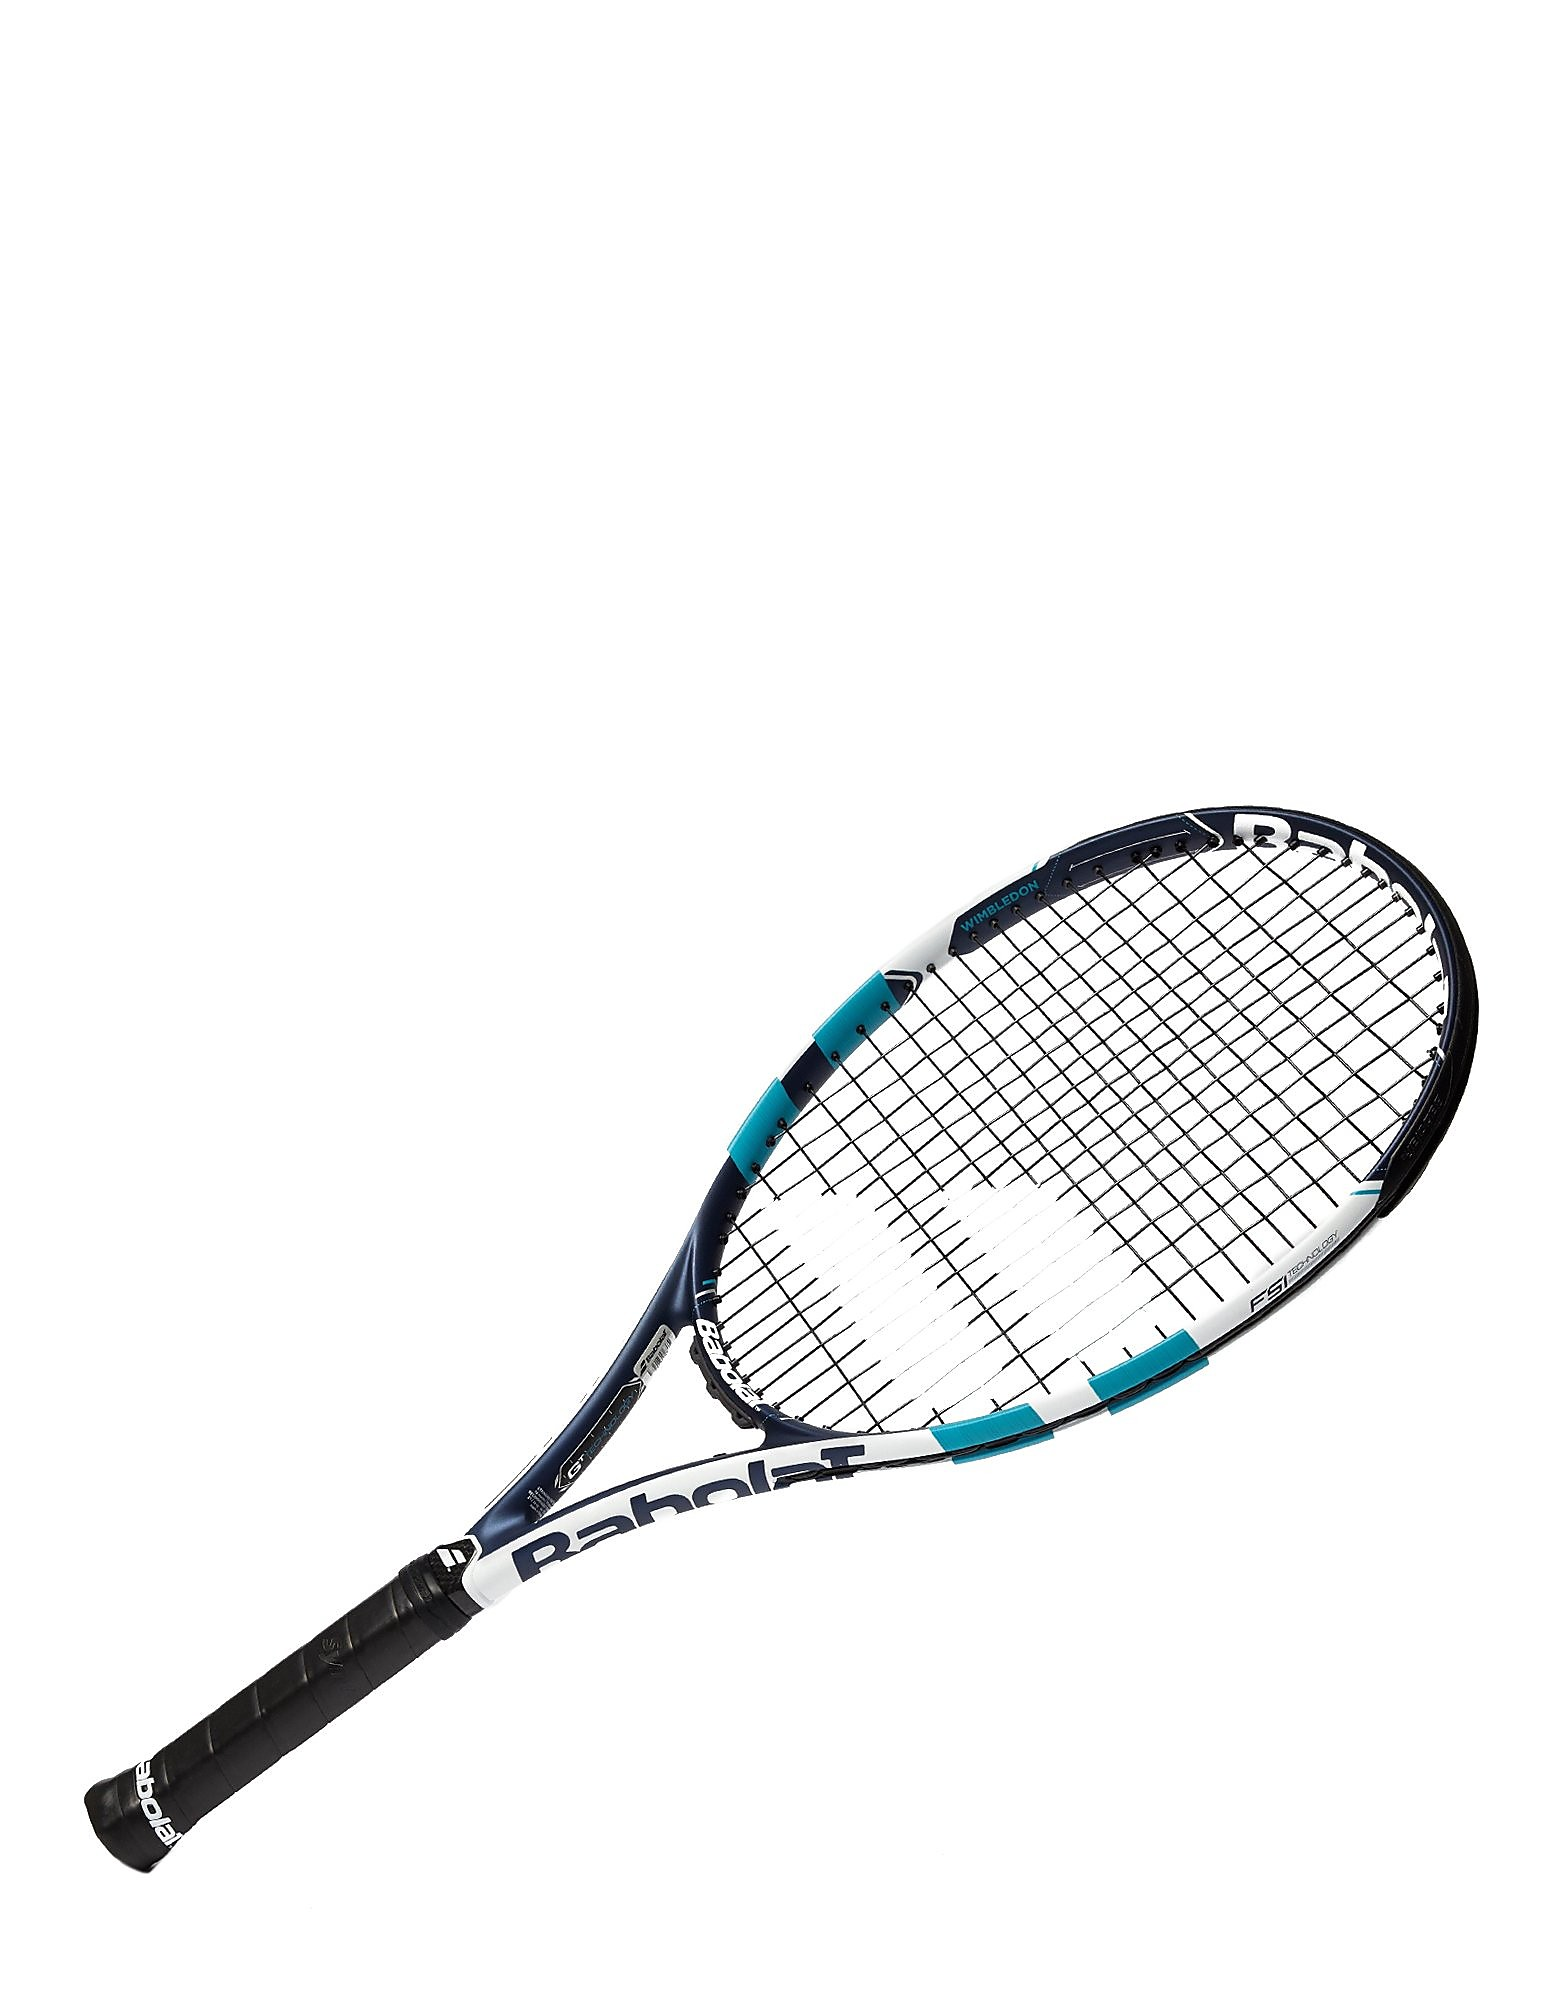 Babolat Pure Drive 26 Tennis Racket